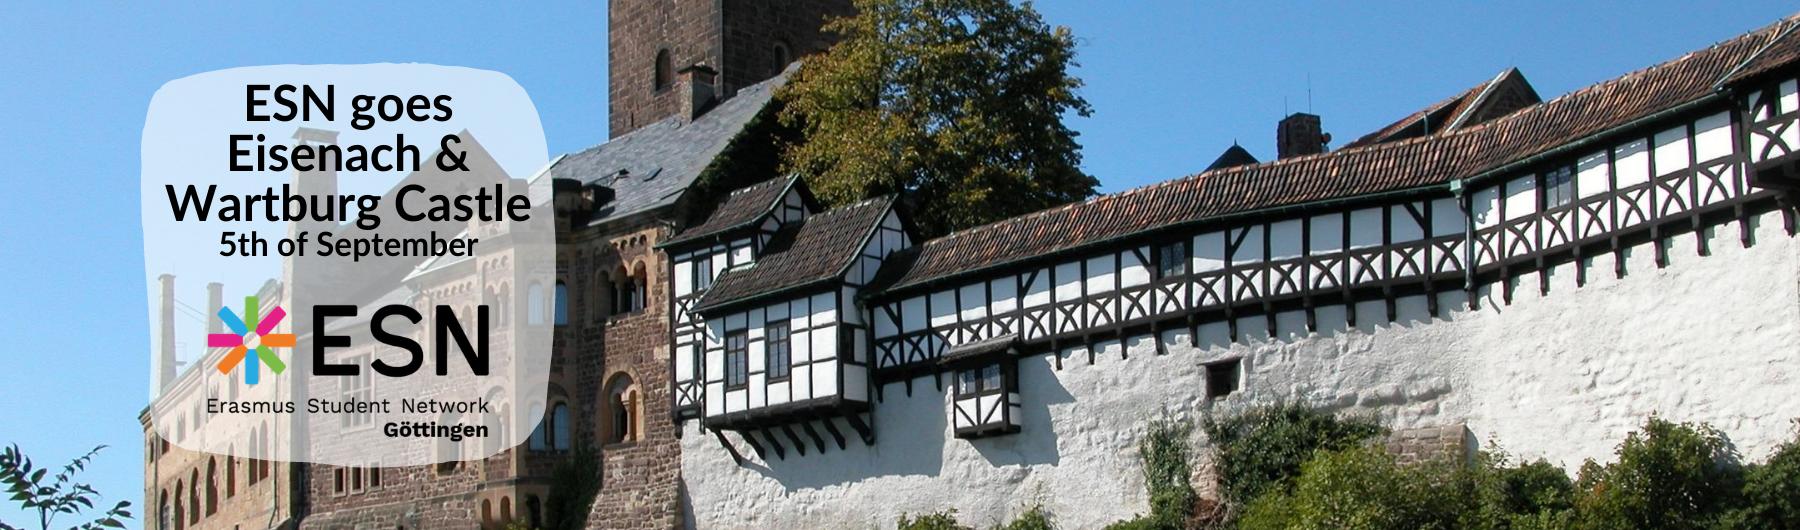 ESN goes Eisenach & Wartburg Castle